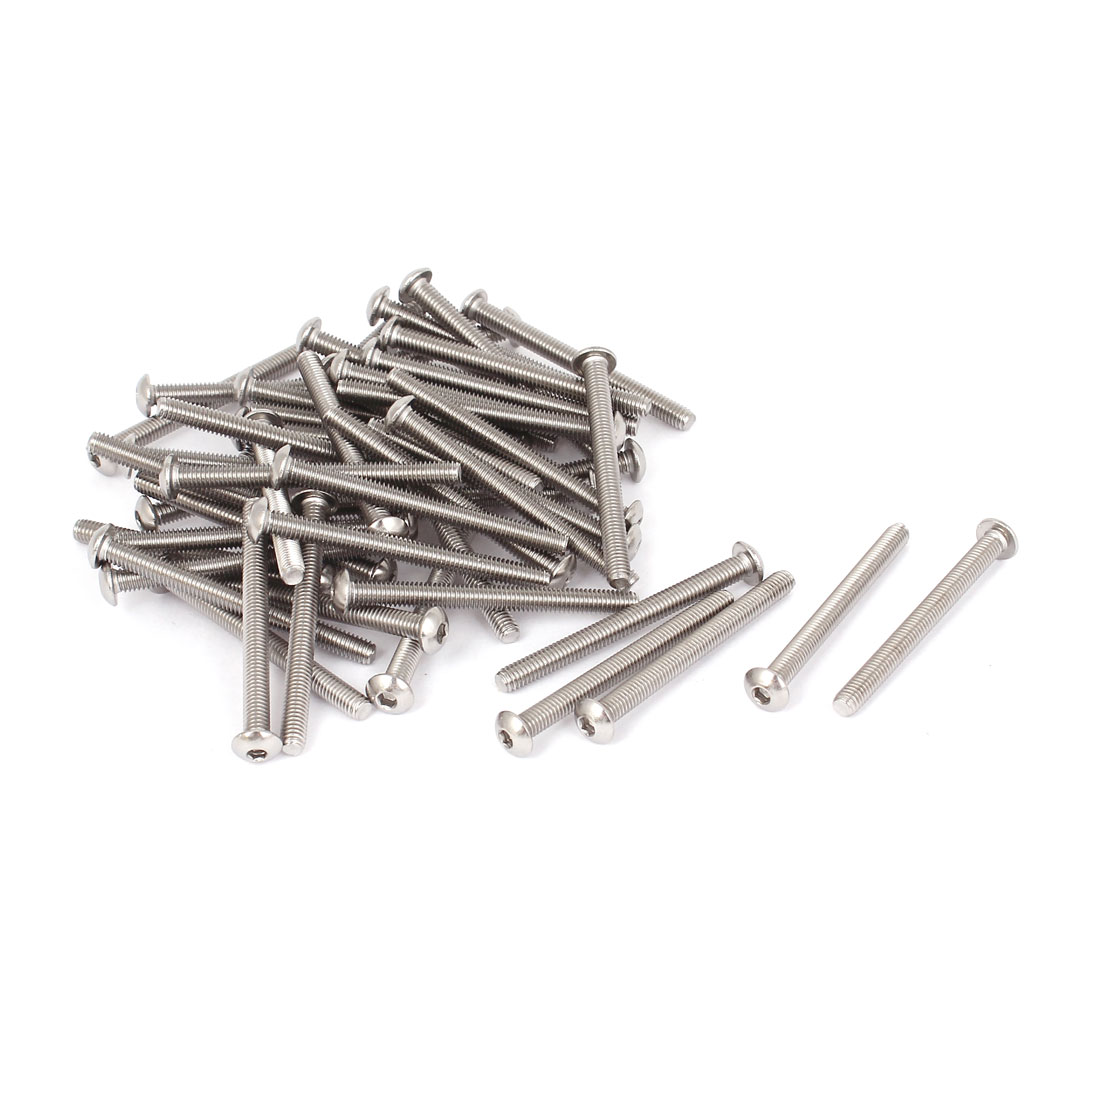 50 Pcs M4x45mm Stainless Steel Hex Socket Button Head Bolts Screws 47mm Long